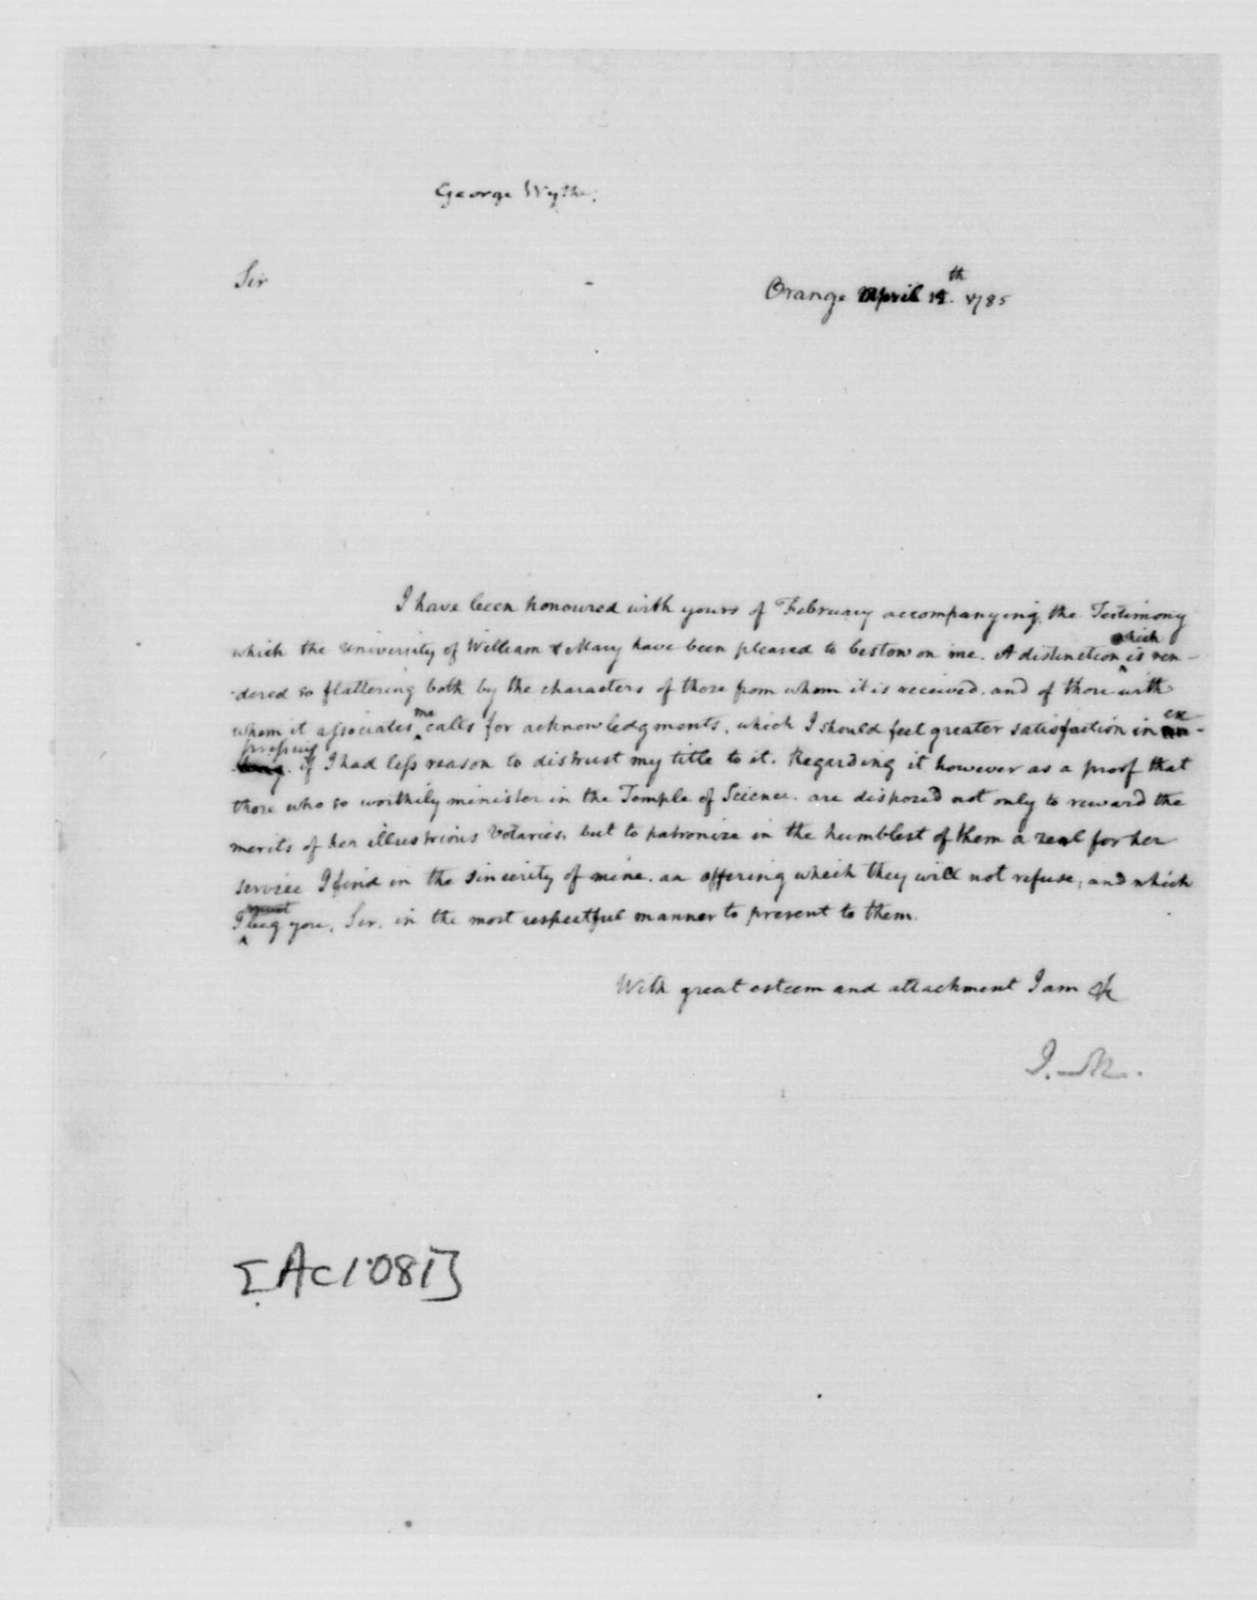 James Madison to George 'Wythe, April 15, 1785.